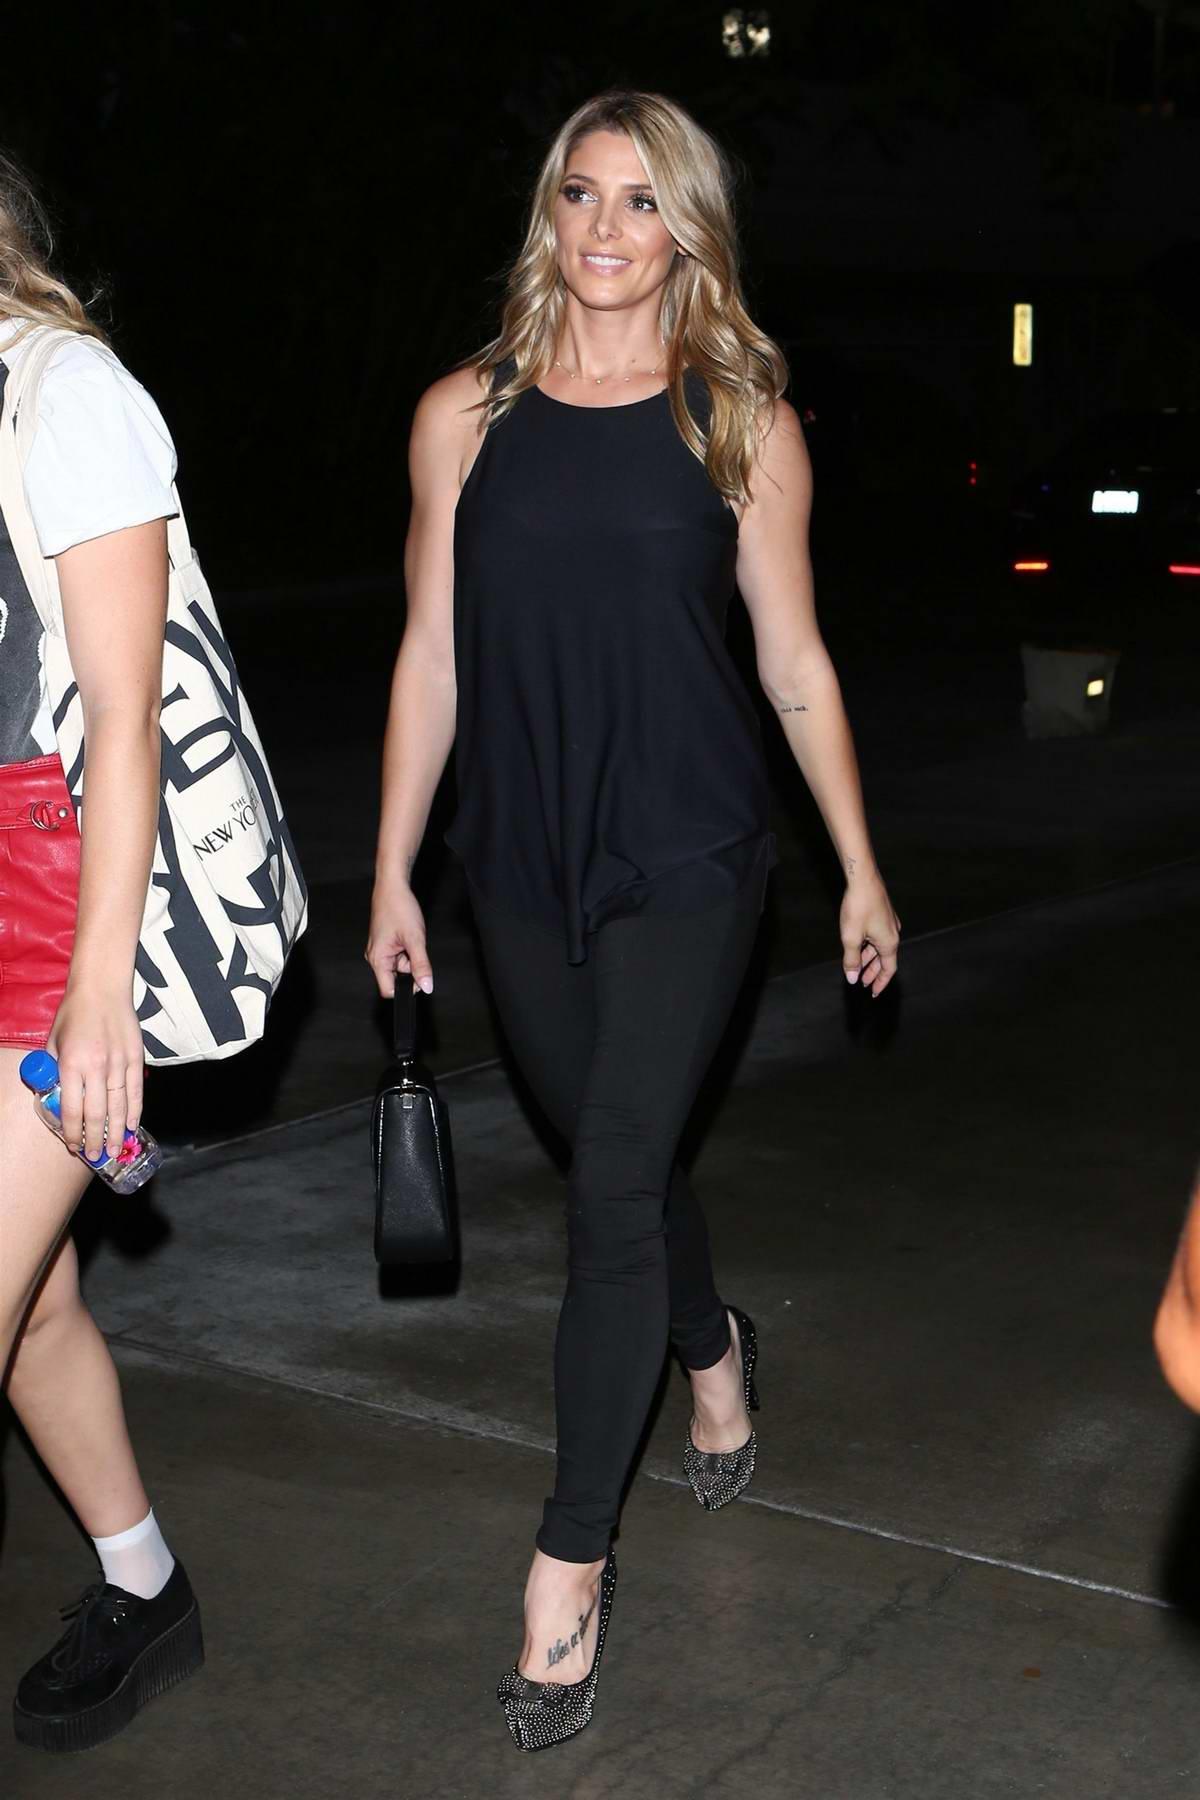 Ashley Greene attends Ed Sheeran in concert in Los Angeles